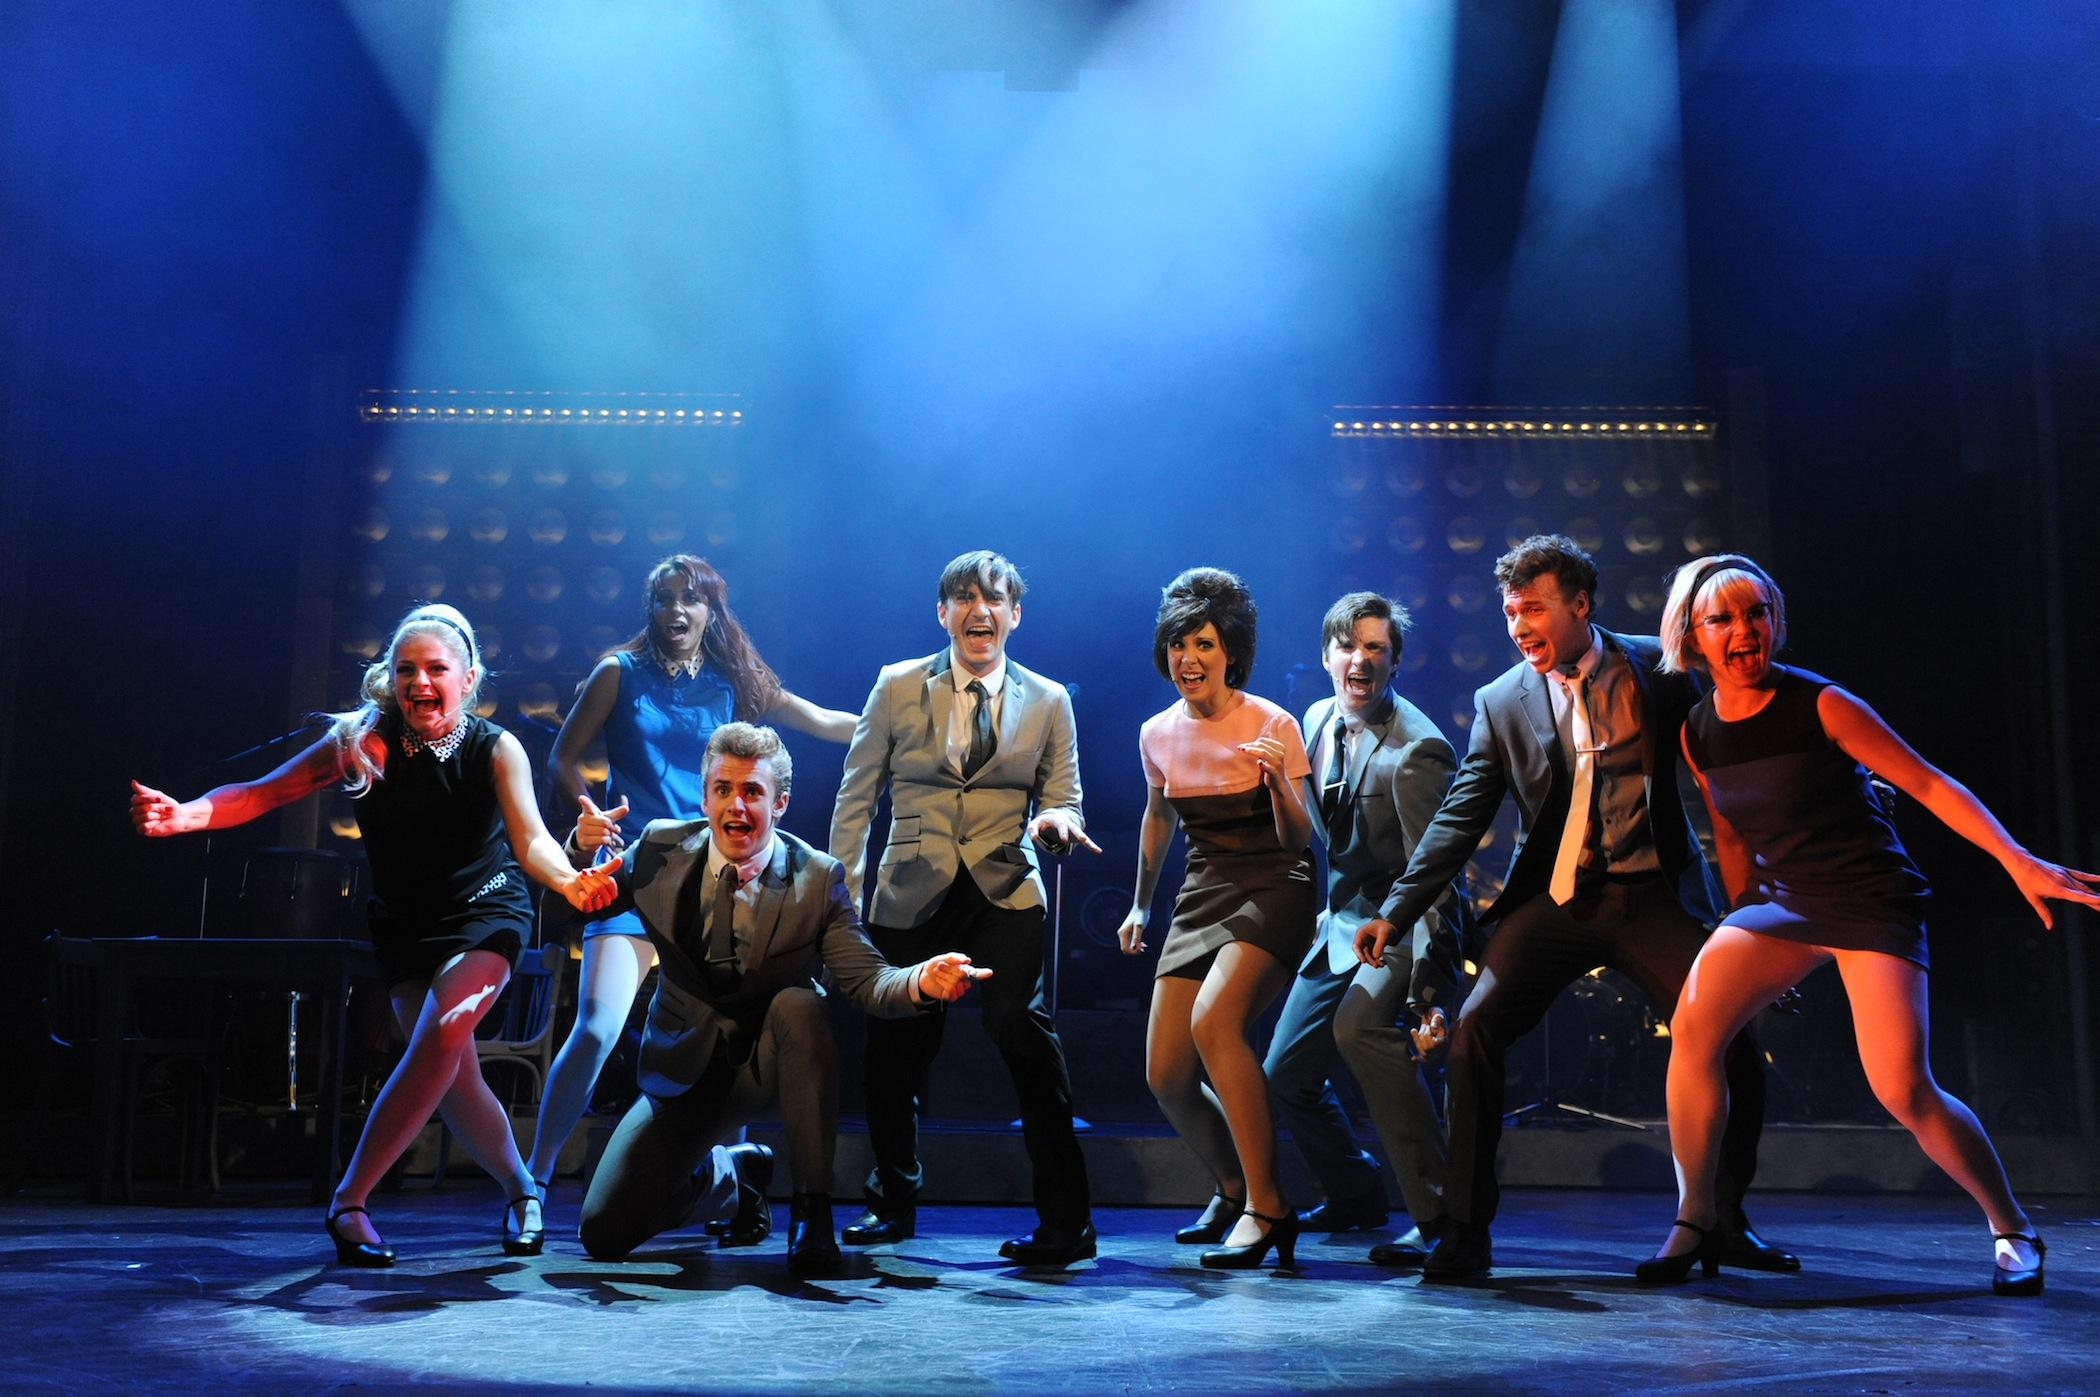 Image of full cast dancing